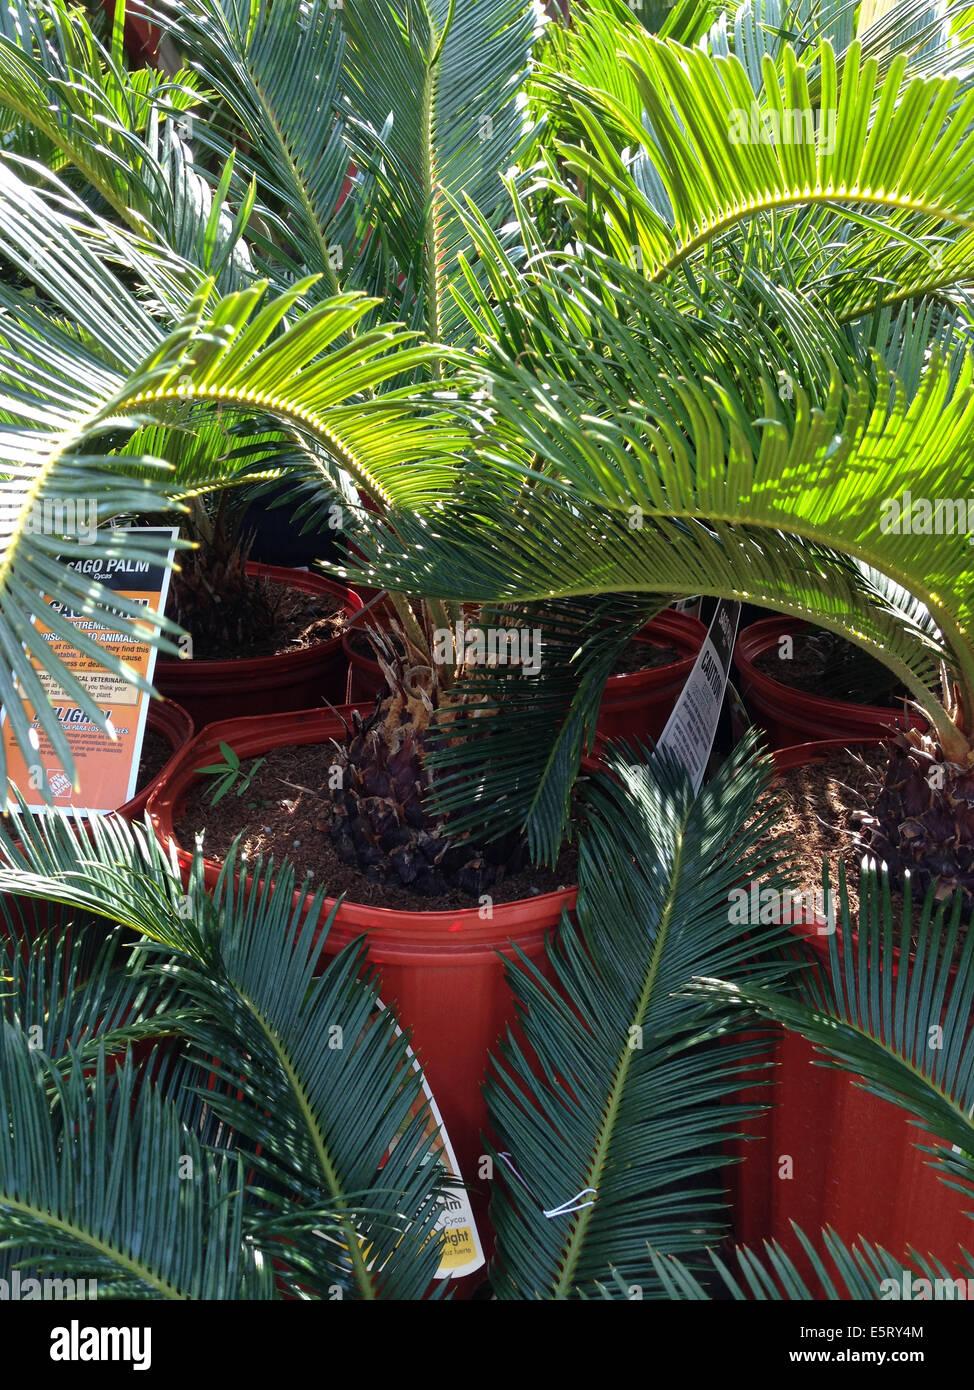 sago palms stock photos sago palms stock images alamy. Black Bedroom Furniture Sets. Home Design Ideas